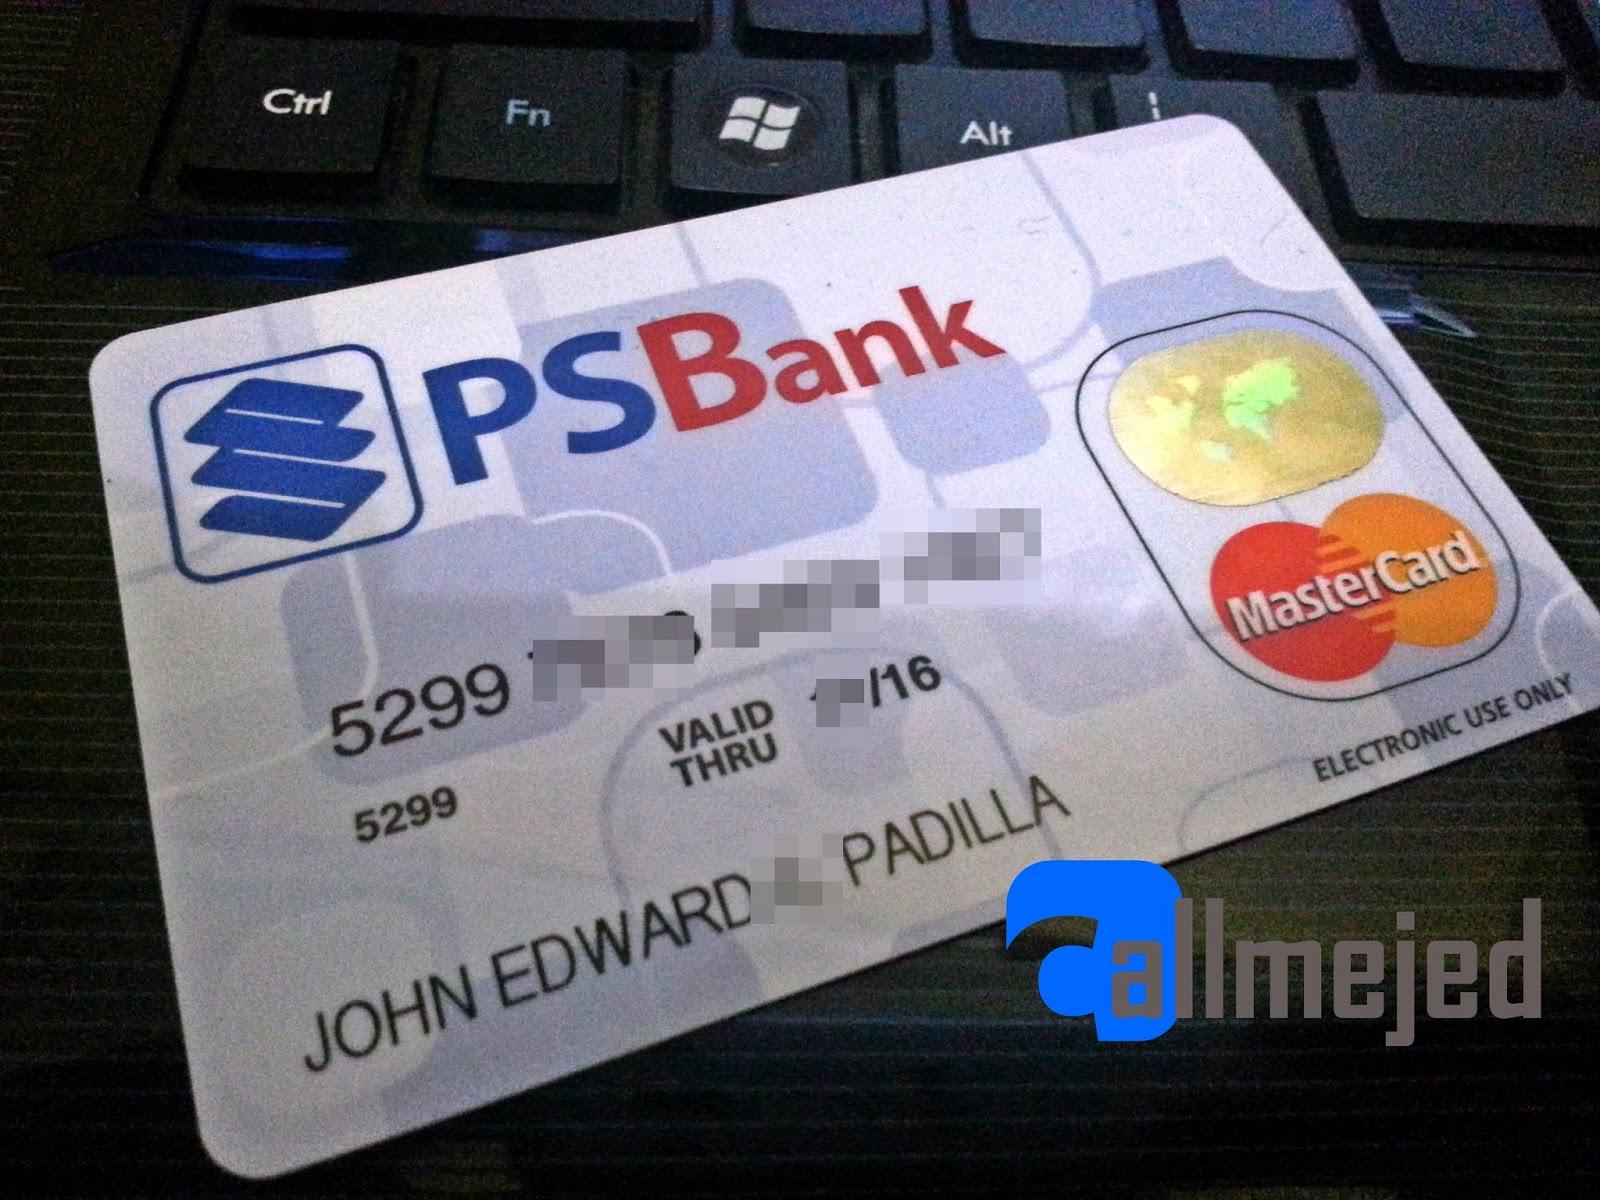 thewalkingjed psbank debit mastercard review